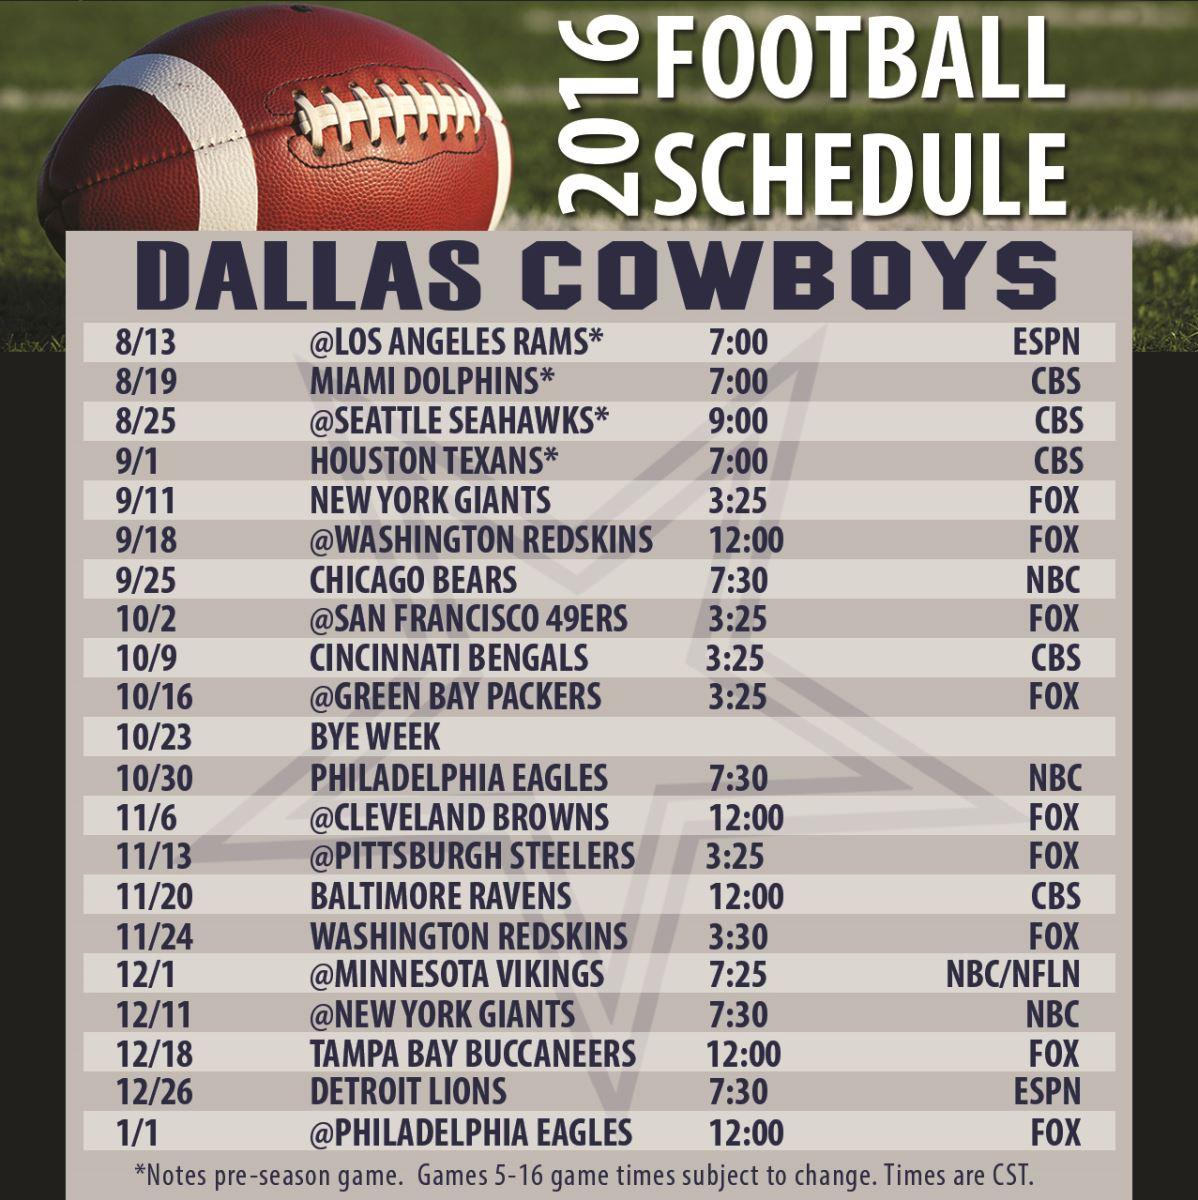 Cowboys Football Schedule For 2016 2017 Season